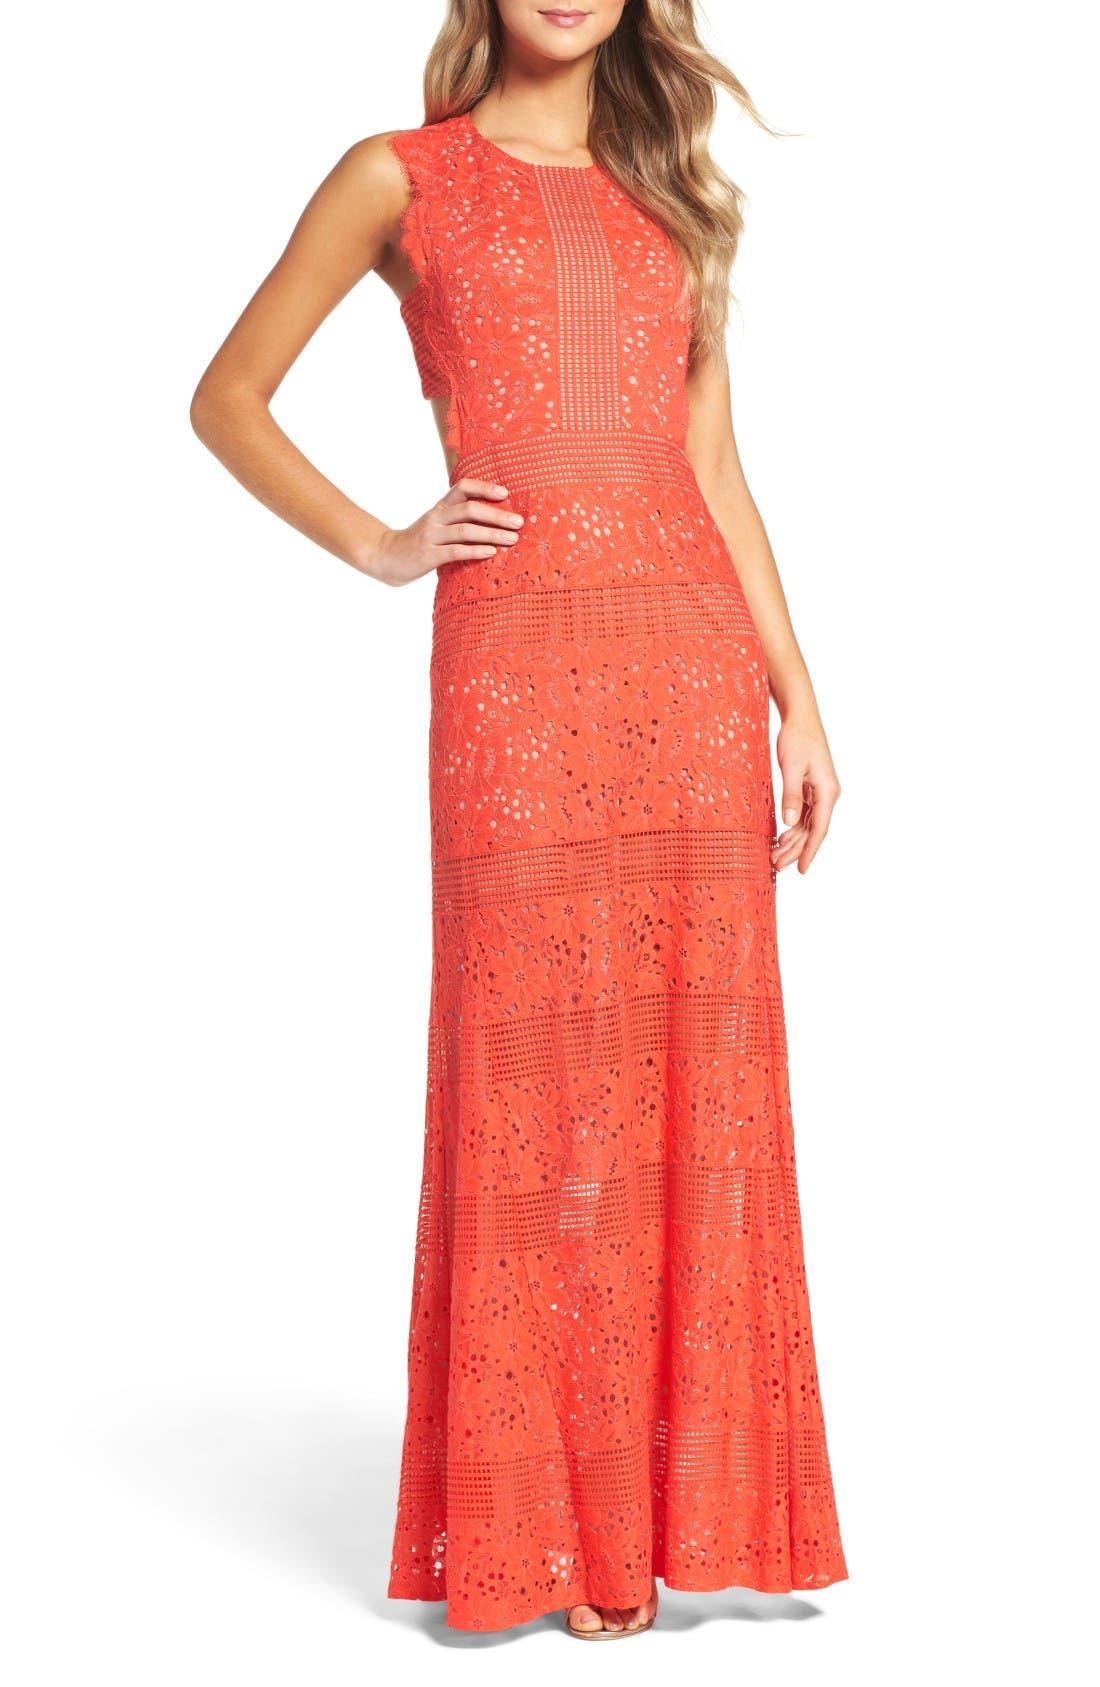 Main Image - BCBGMAXAZRIA Merida Open Back Lace Gown